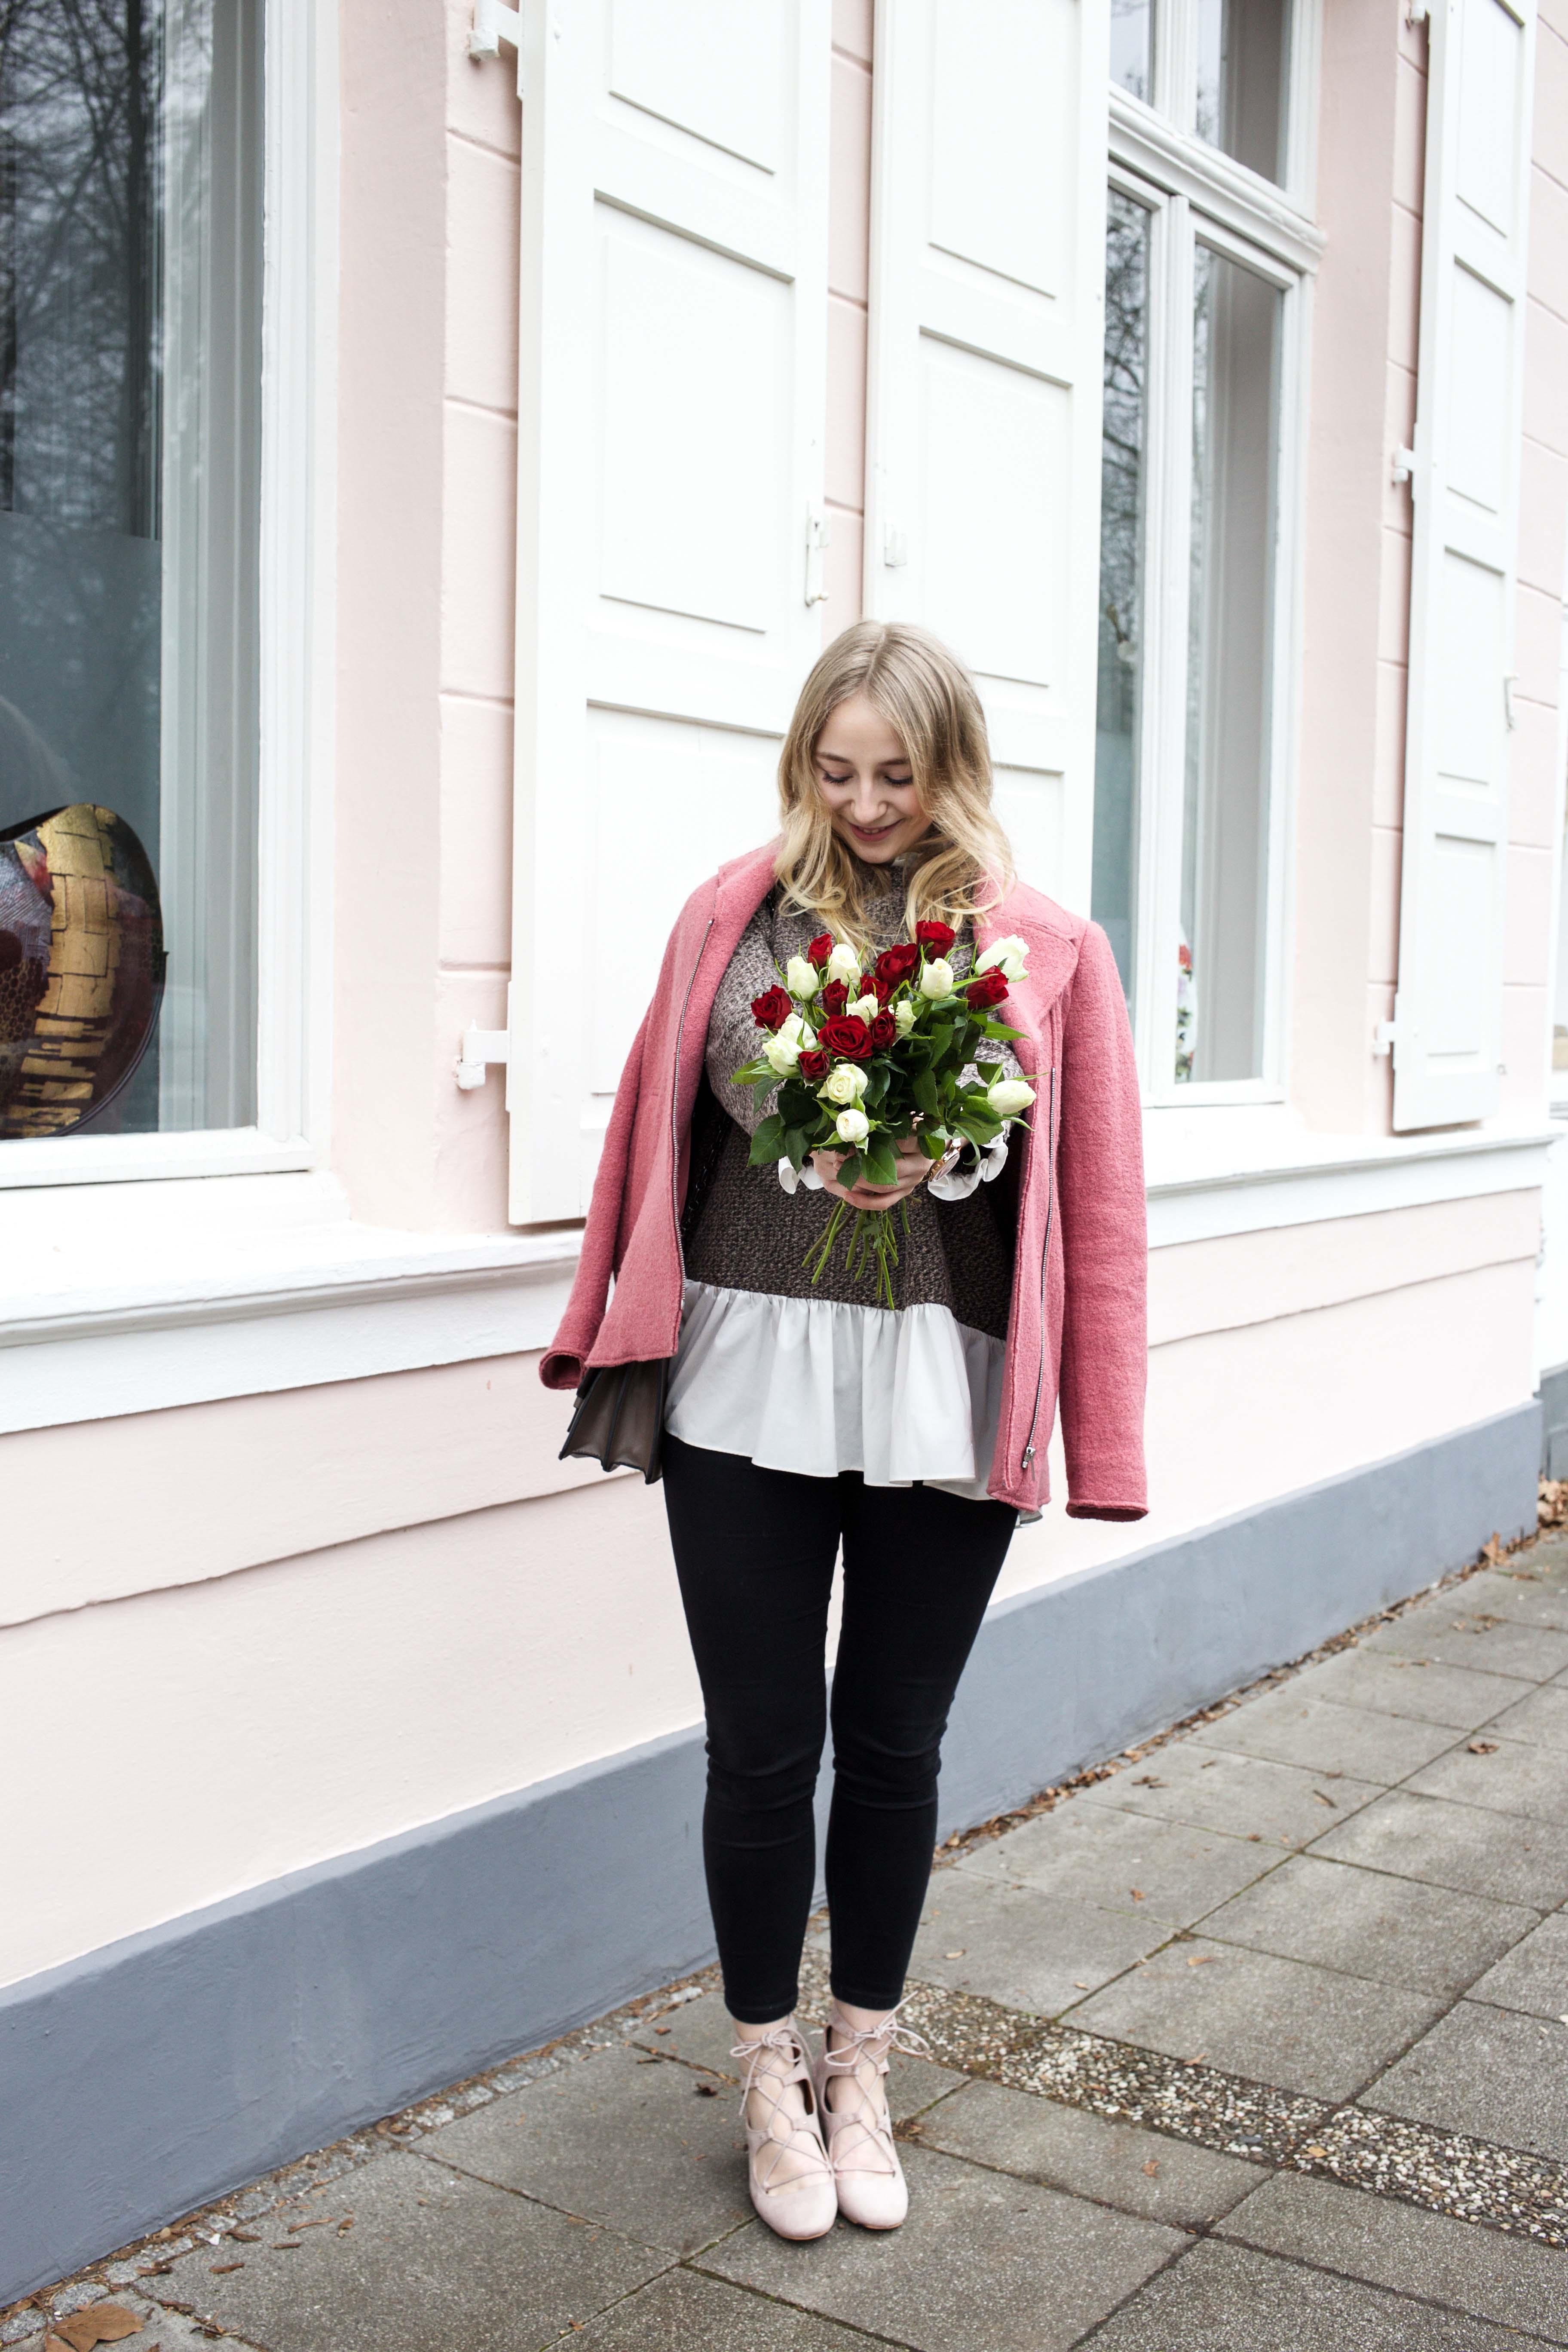 be-my-valentine-romantisches-valentinstags-outfit-valentinstag-inspiration-fashionblog_0190